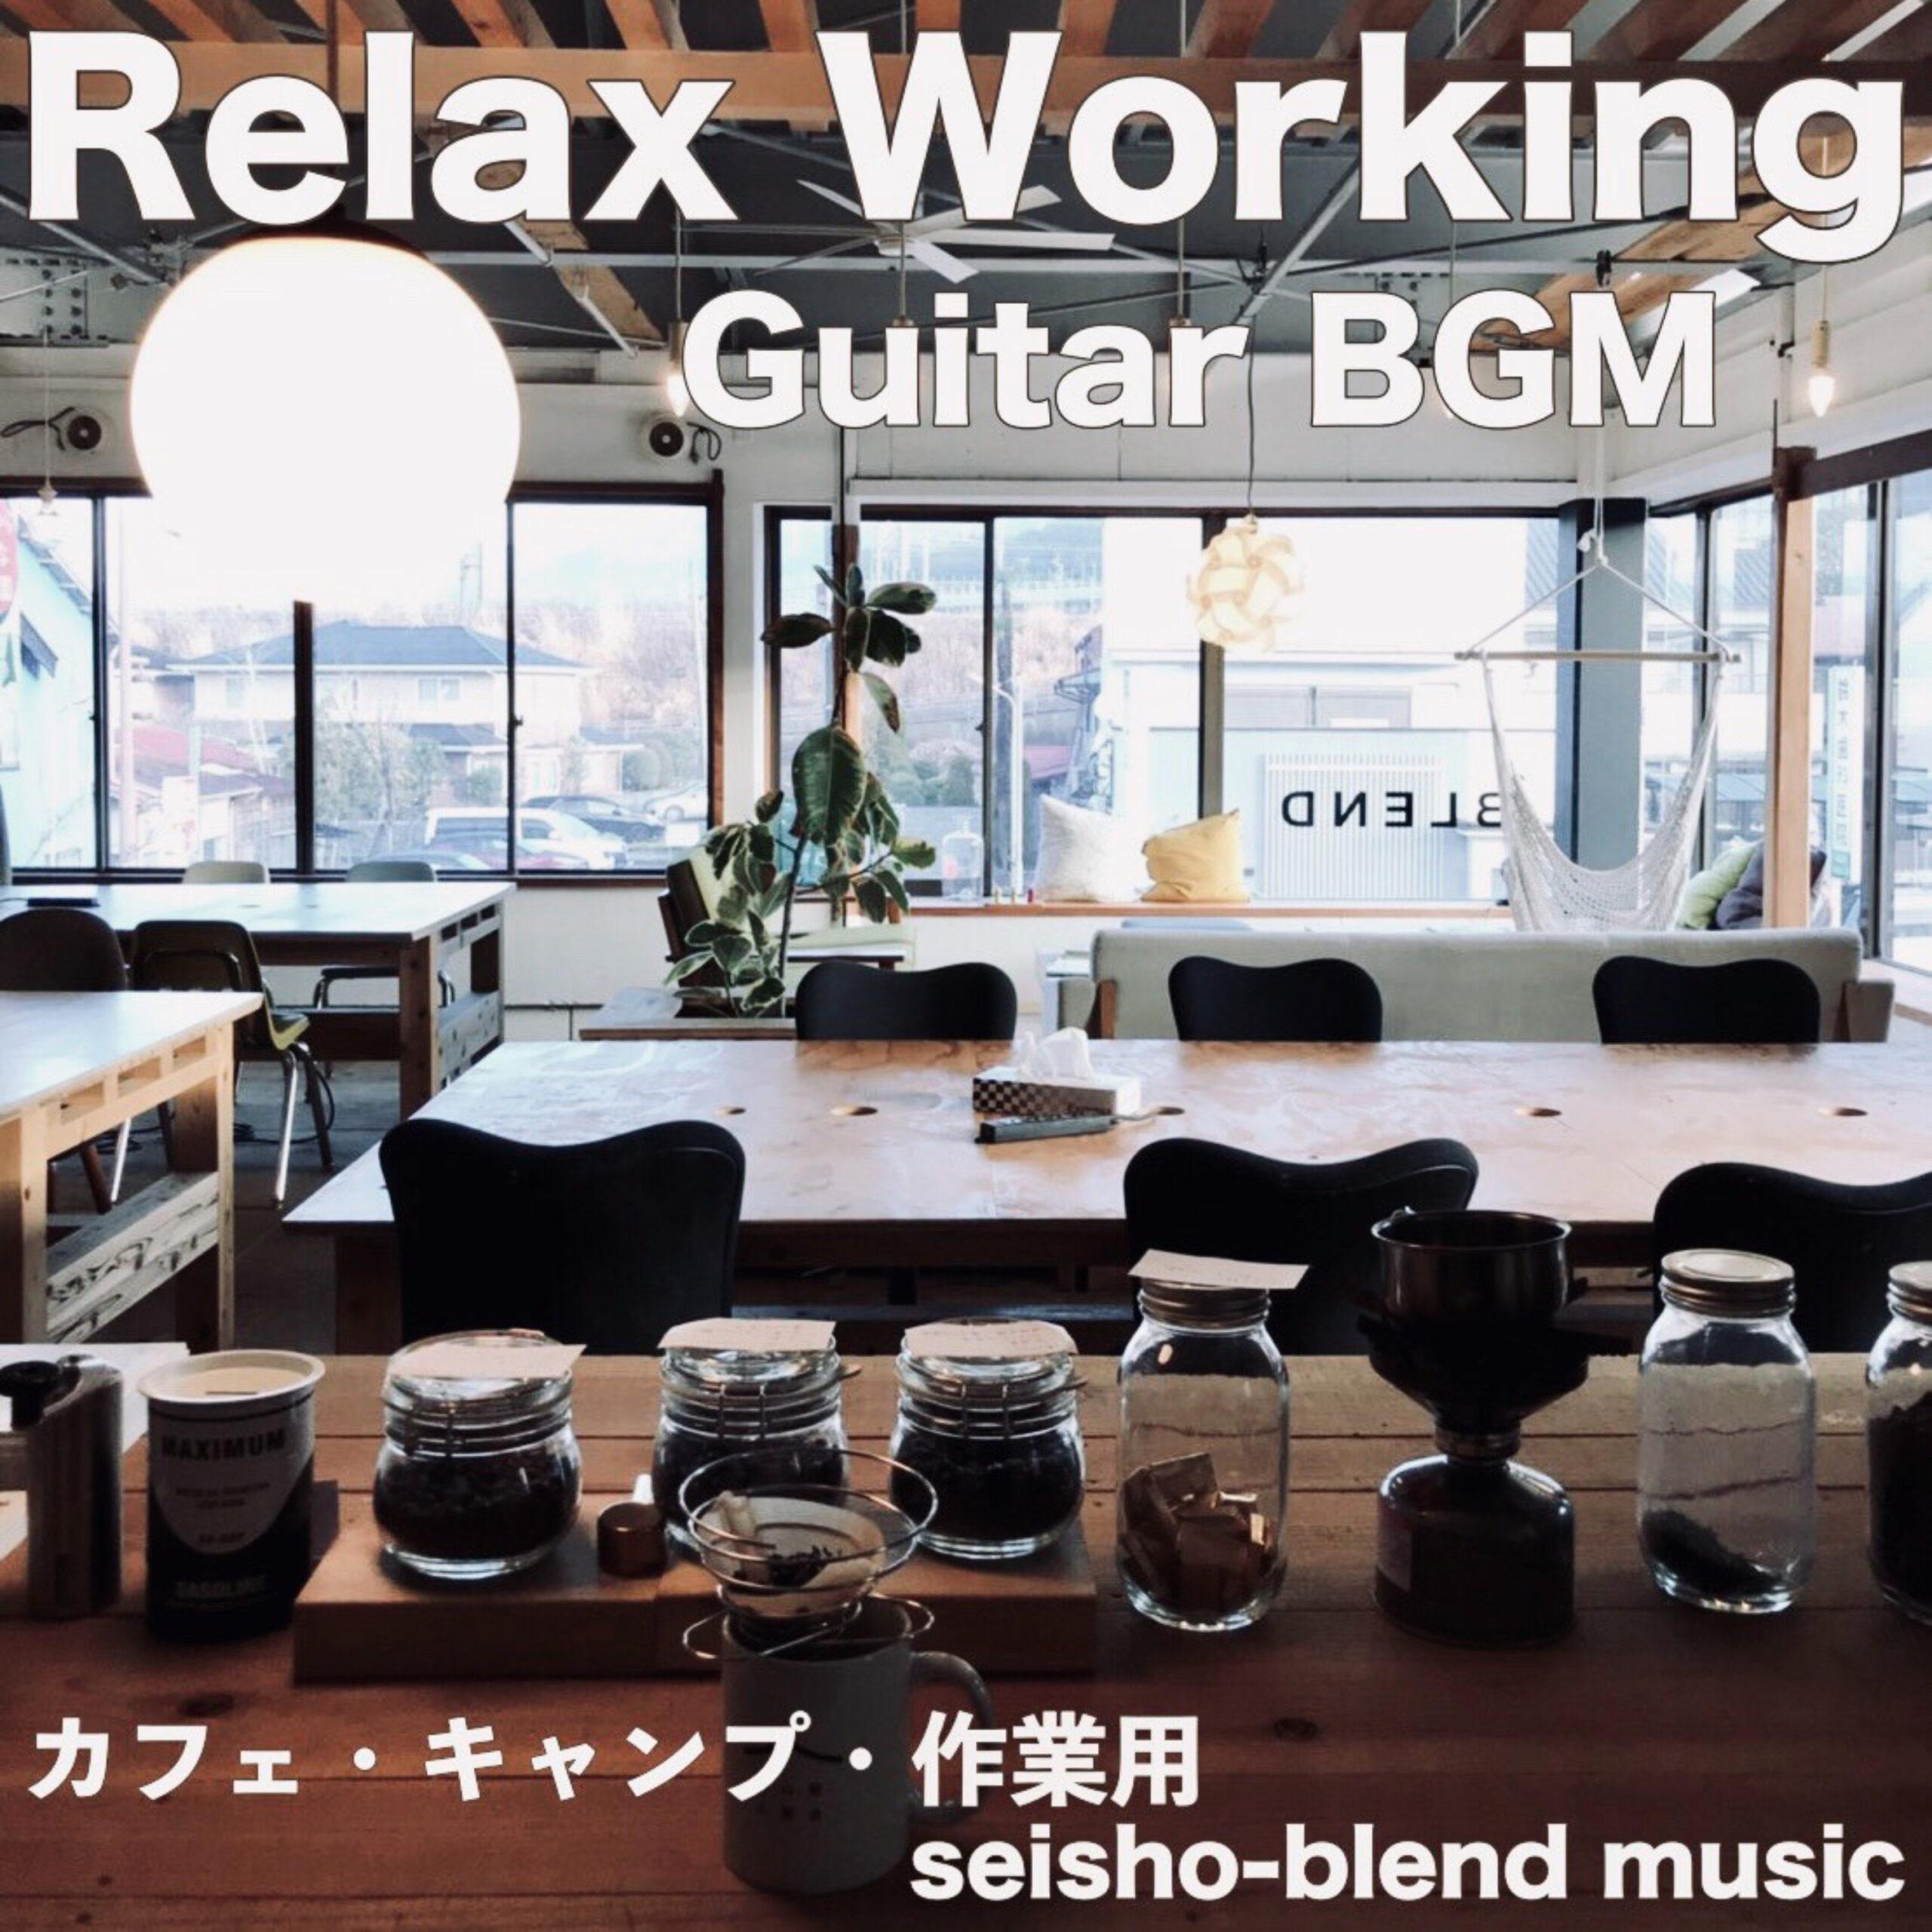 Relax Working Guitar BGM カフェ・キャンプ・作業用 seisho-blend music